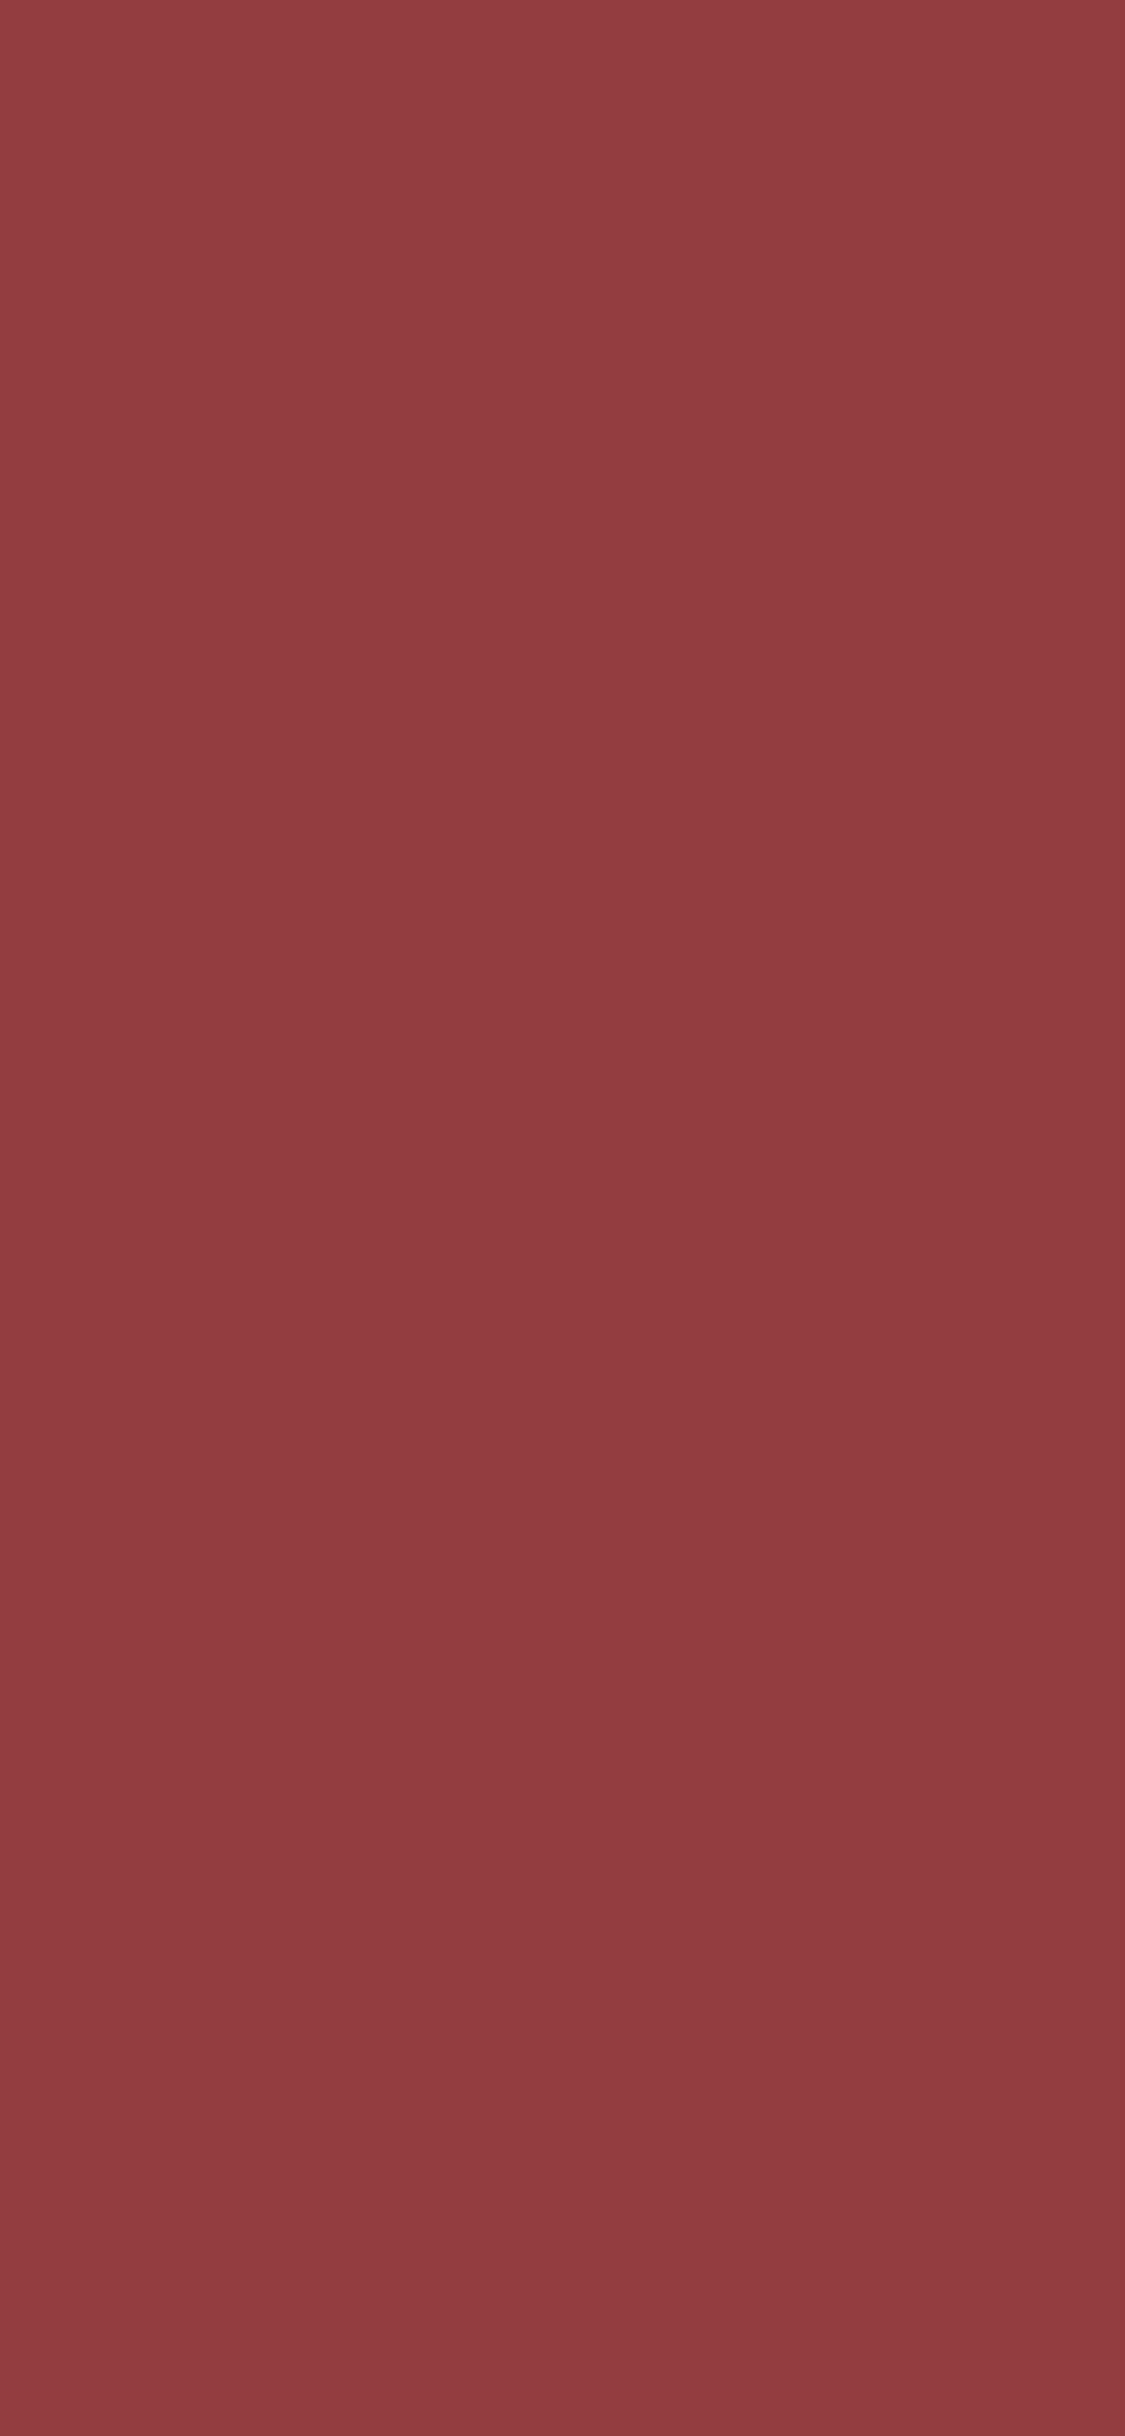 1125x2436 Smokey Topaz Solid Color Background